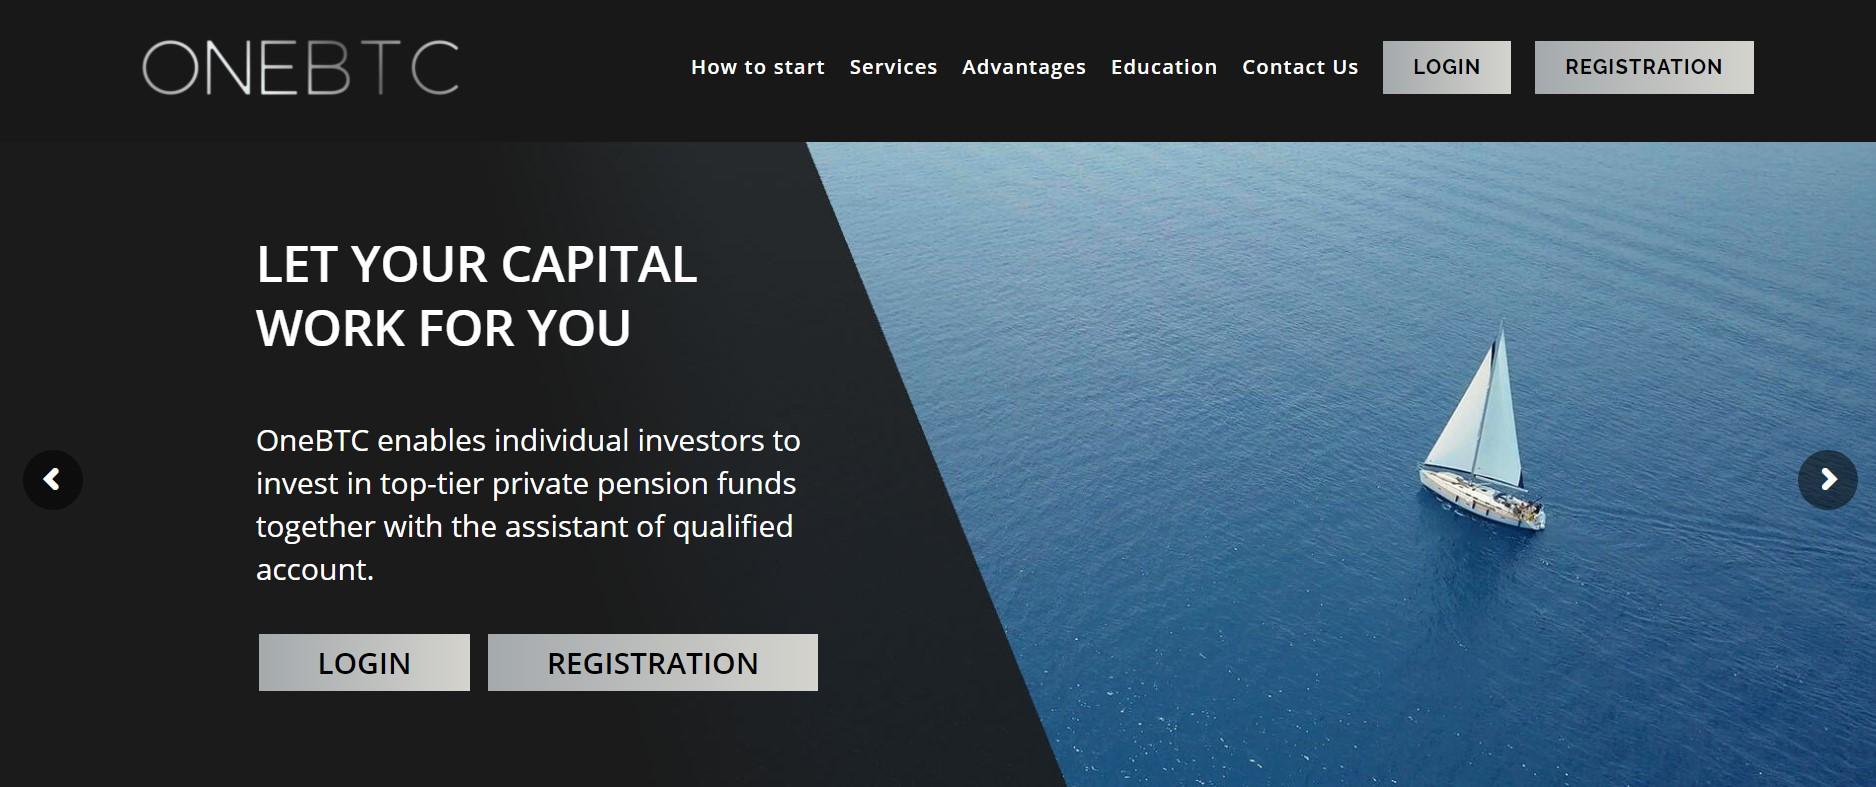 OneBTC website